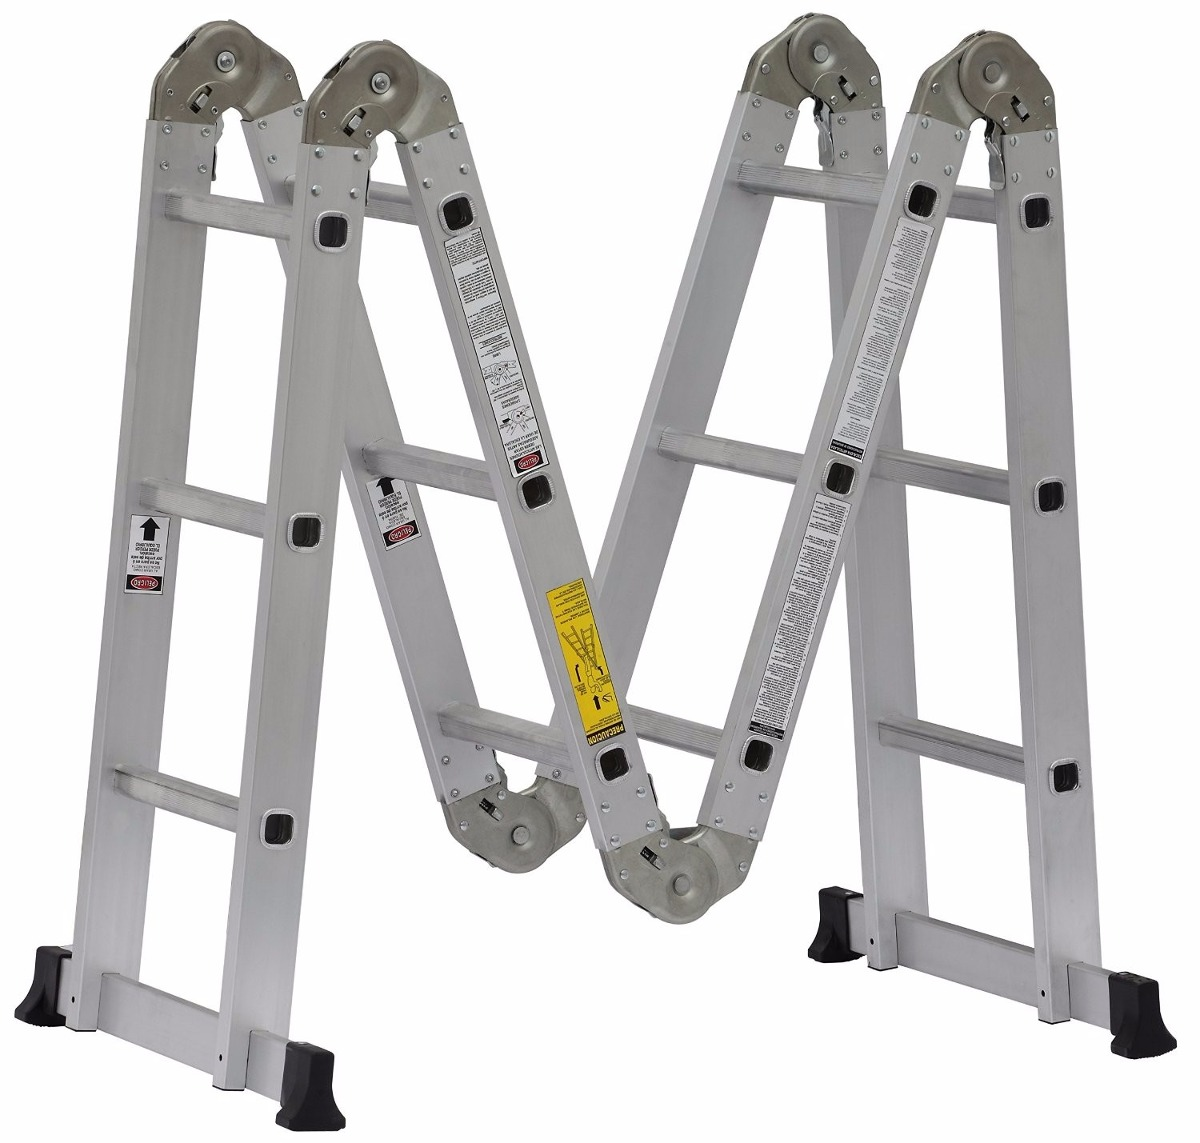 Escalera multiposiciones de aluminio cuprum 150kg 4 metros for Escalera de aluminio de 8 metros